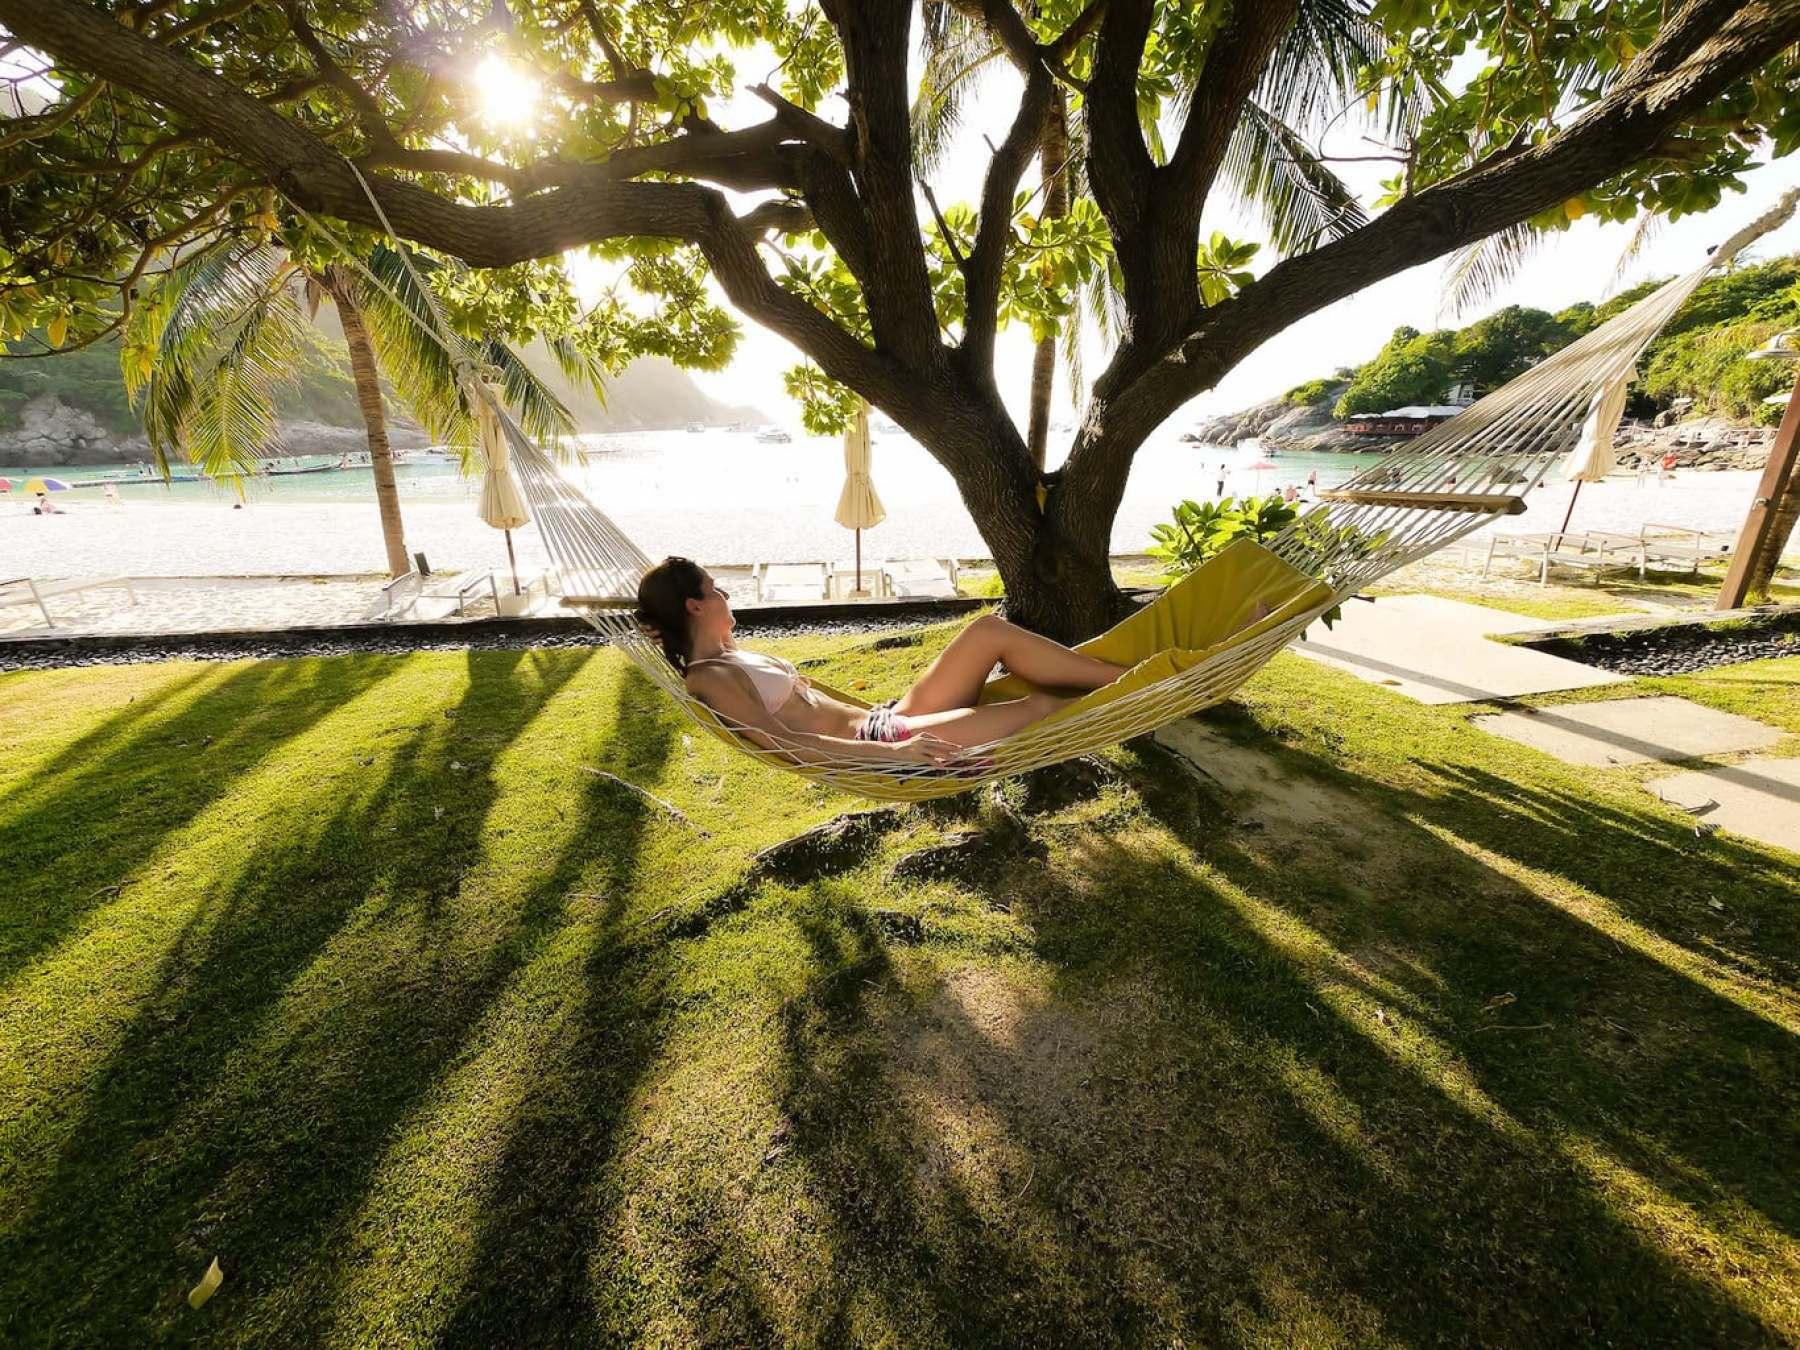 Lounging on a hammock, enjoying the rays of sun